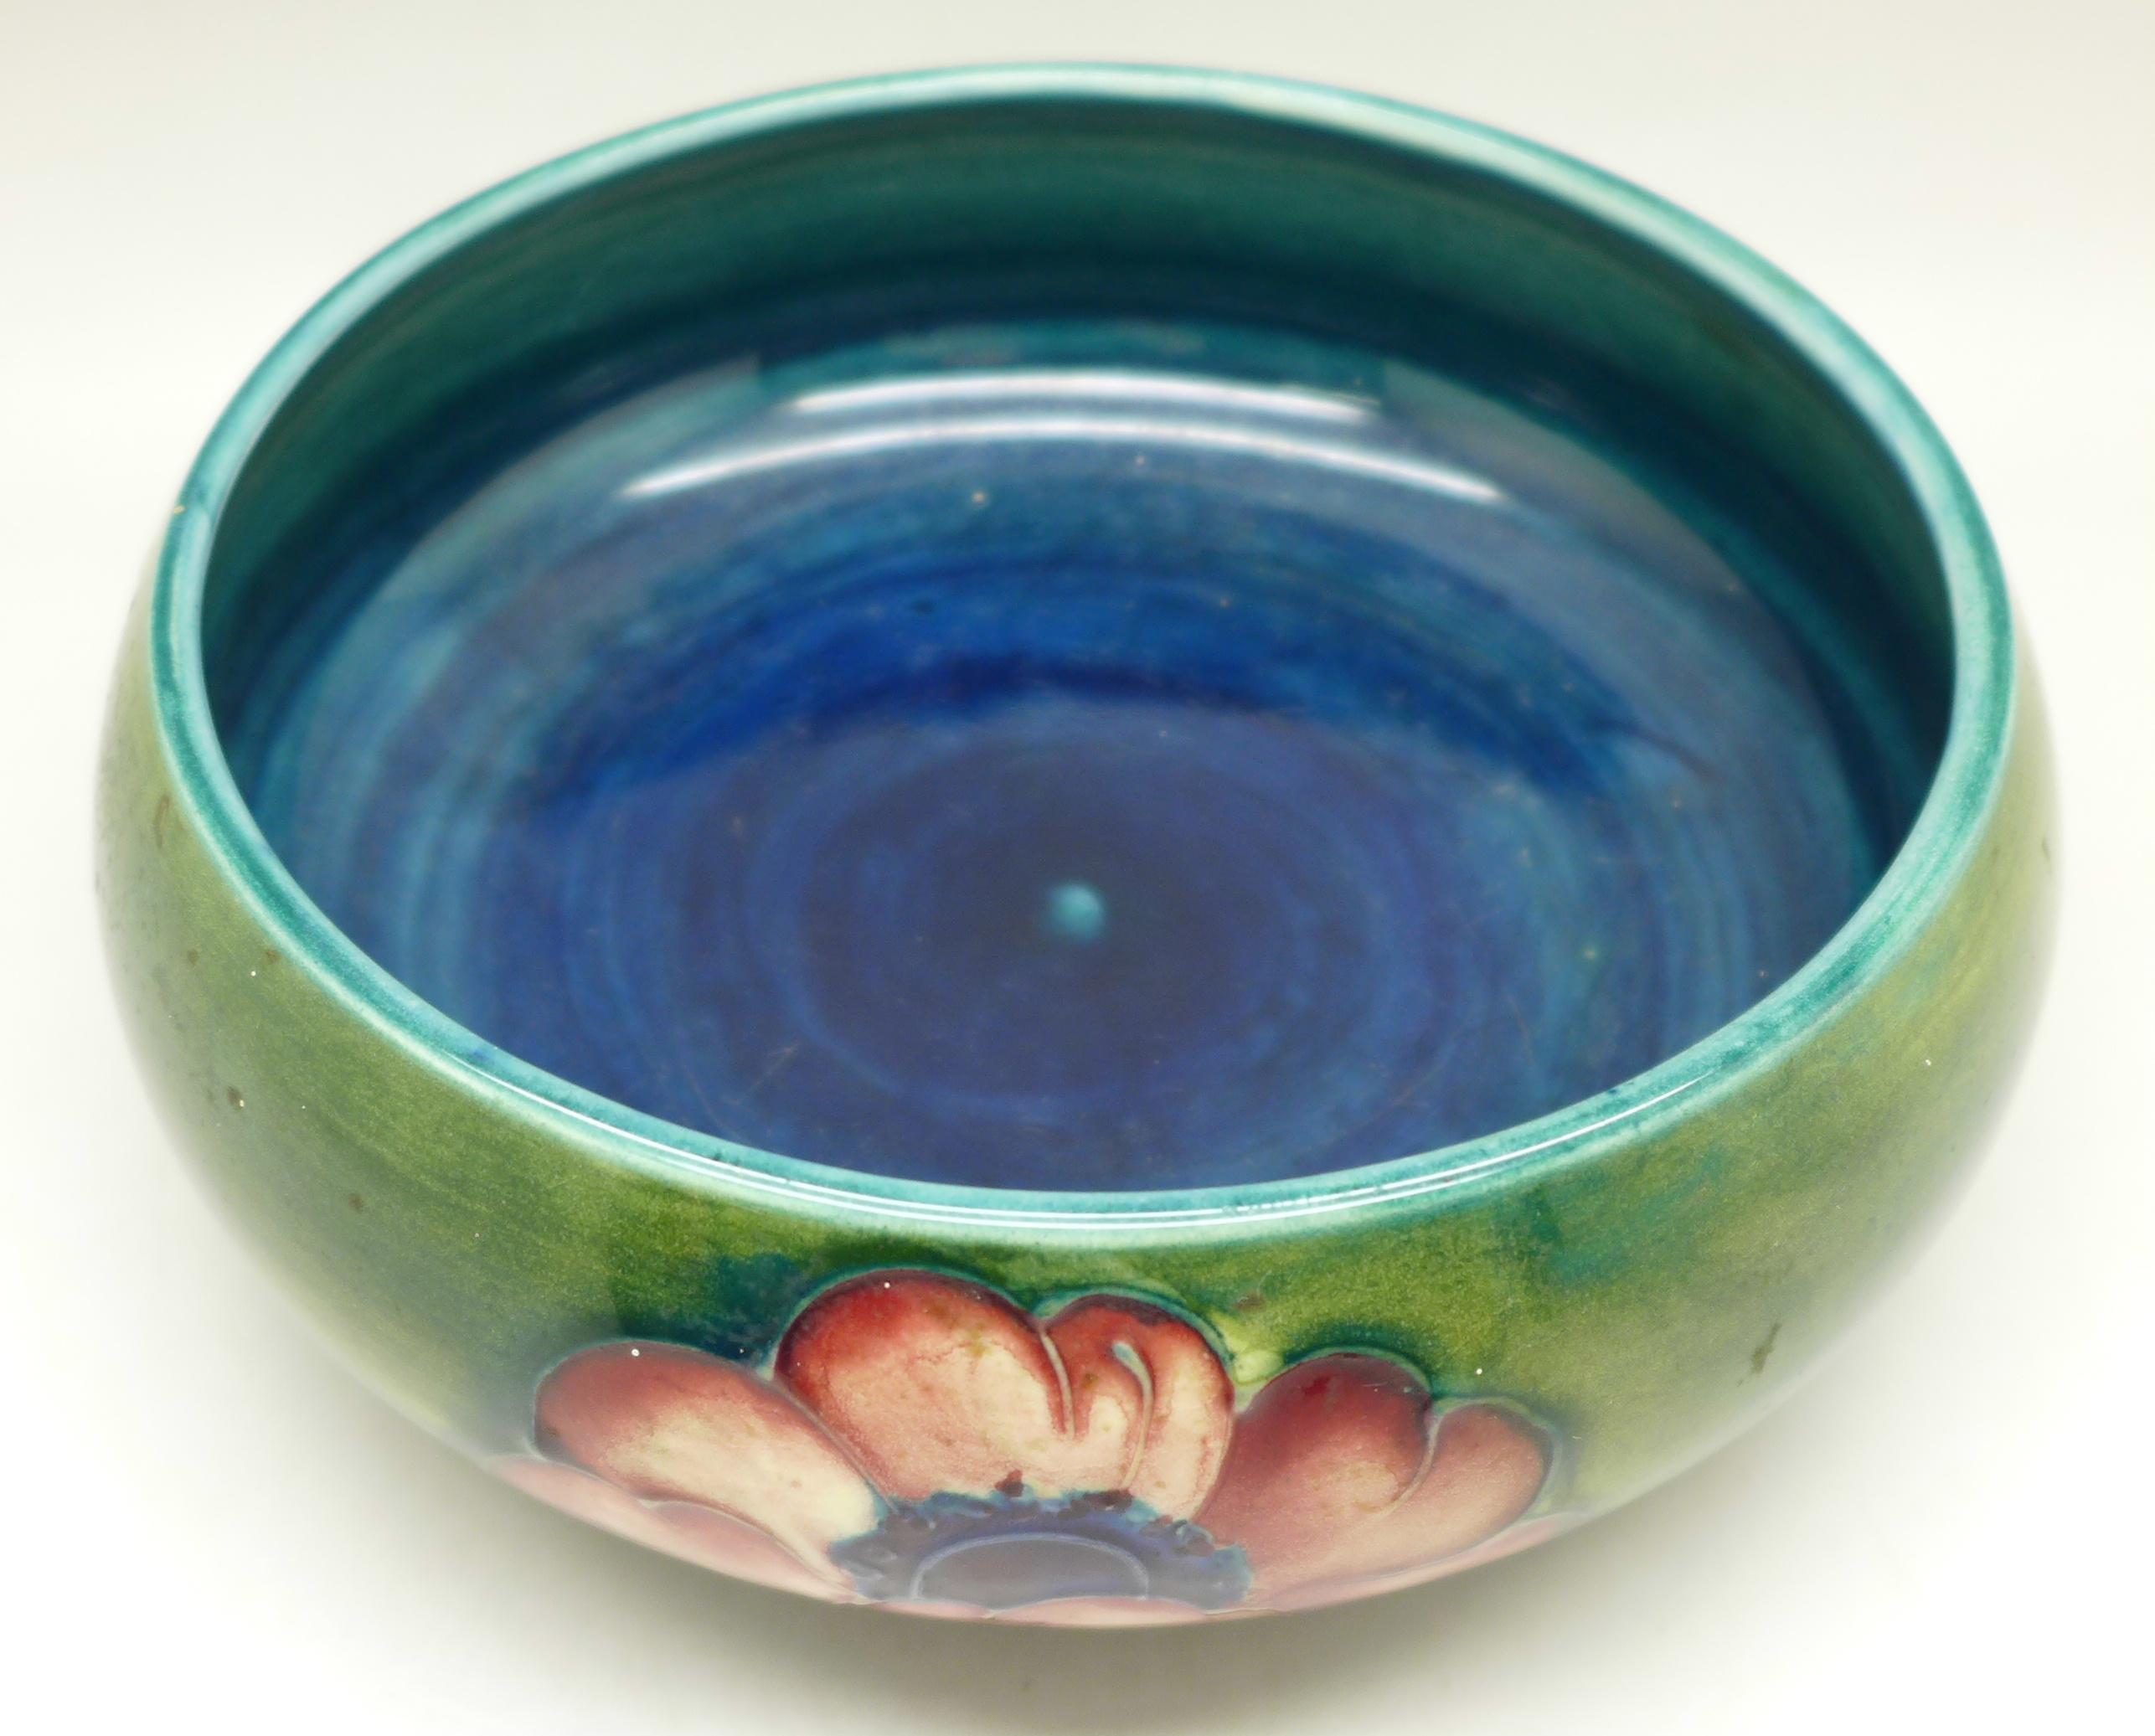 A Moorcroft anemone dish, 13.5cm diameter - Image 2 of 5